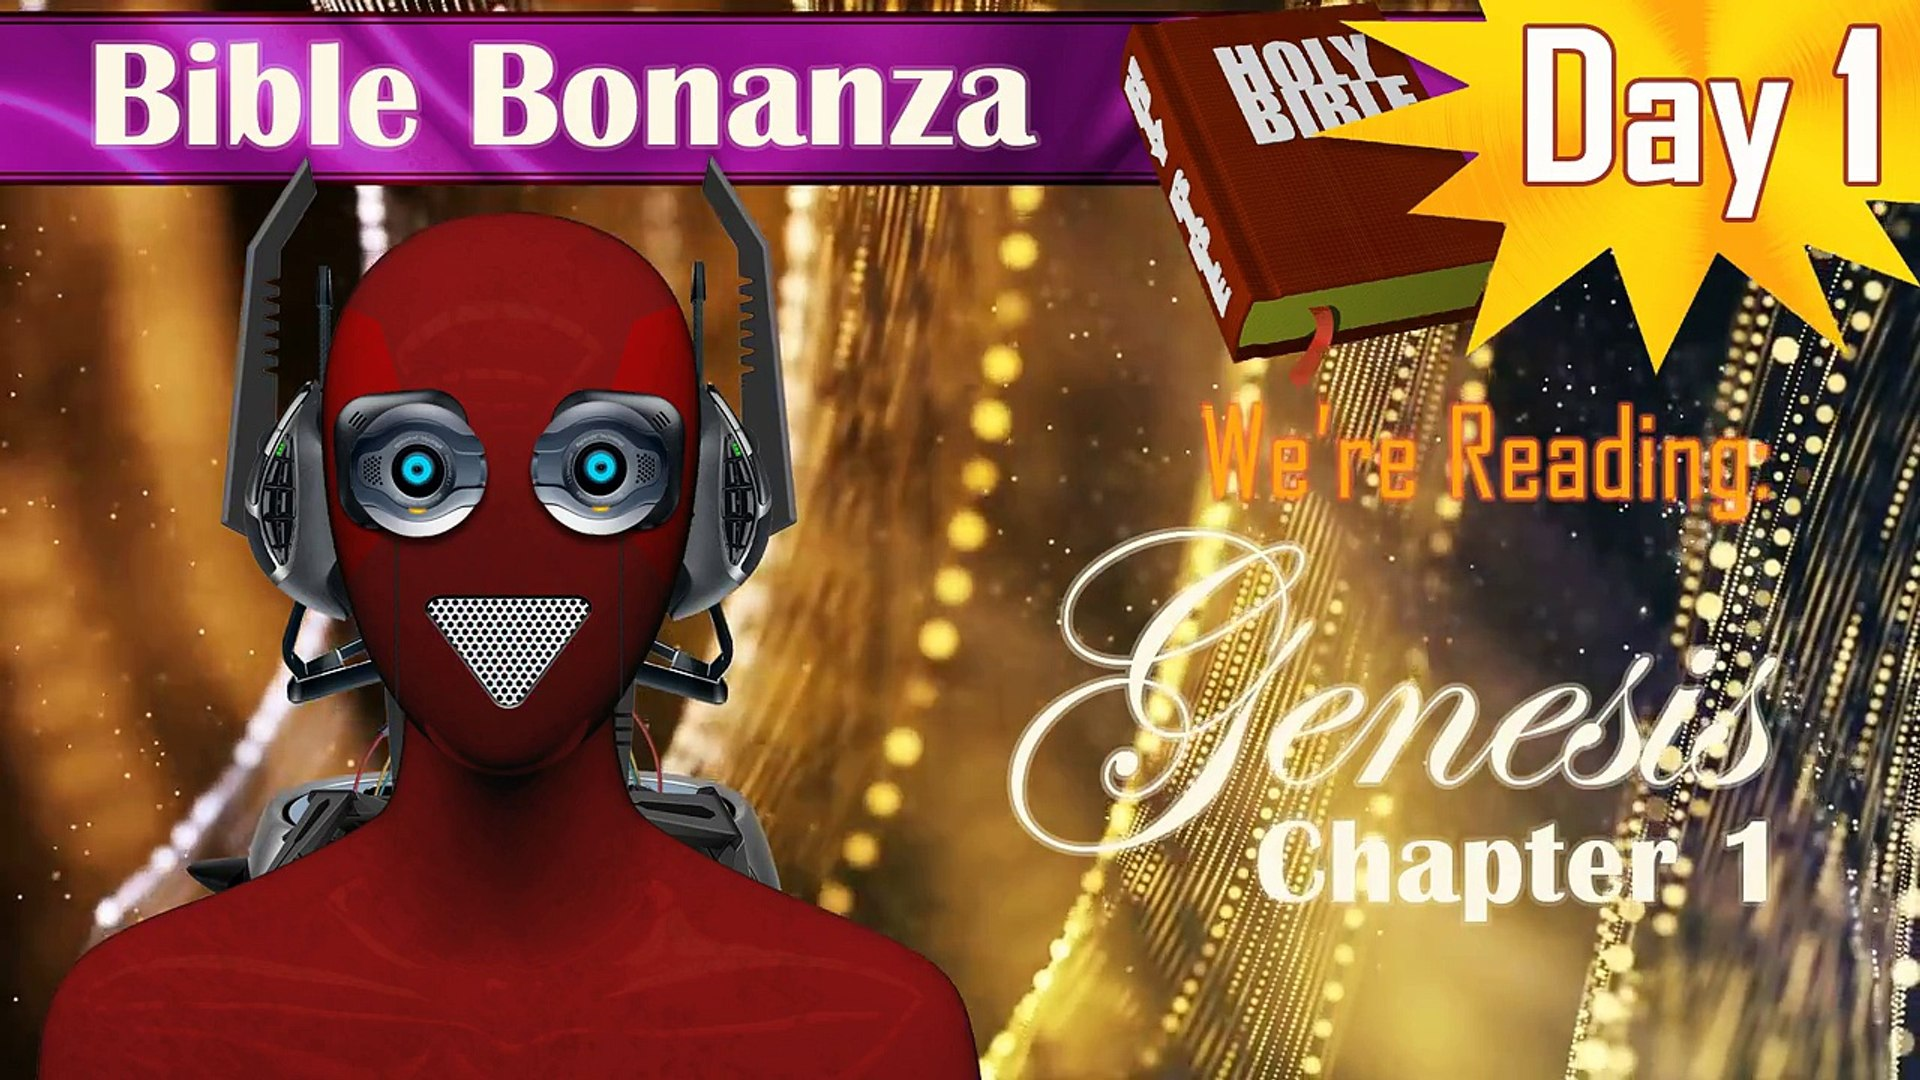 (Genesis 1) Master Human Video's Bible Bonanza - Day 1: Book of Genesis, Chapter 1